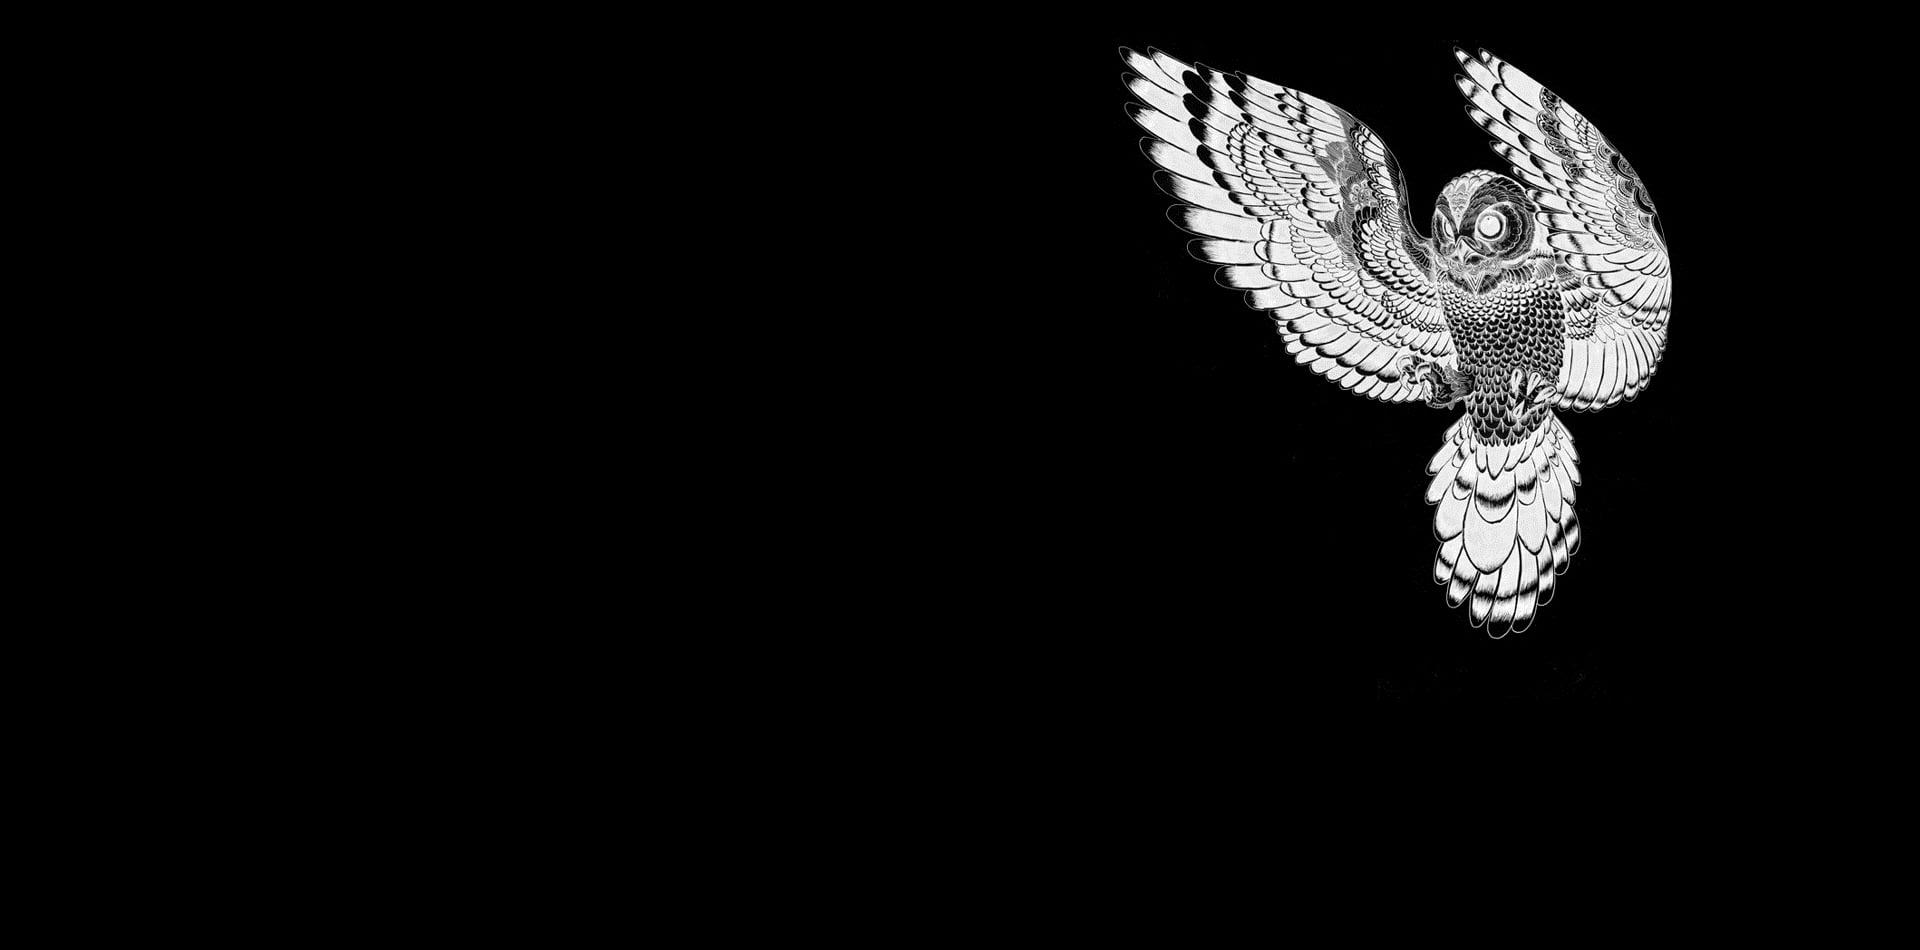 Dark Owl Wallpaper 4k 1920x950 Wallpaper Teahub Io